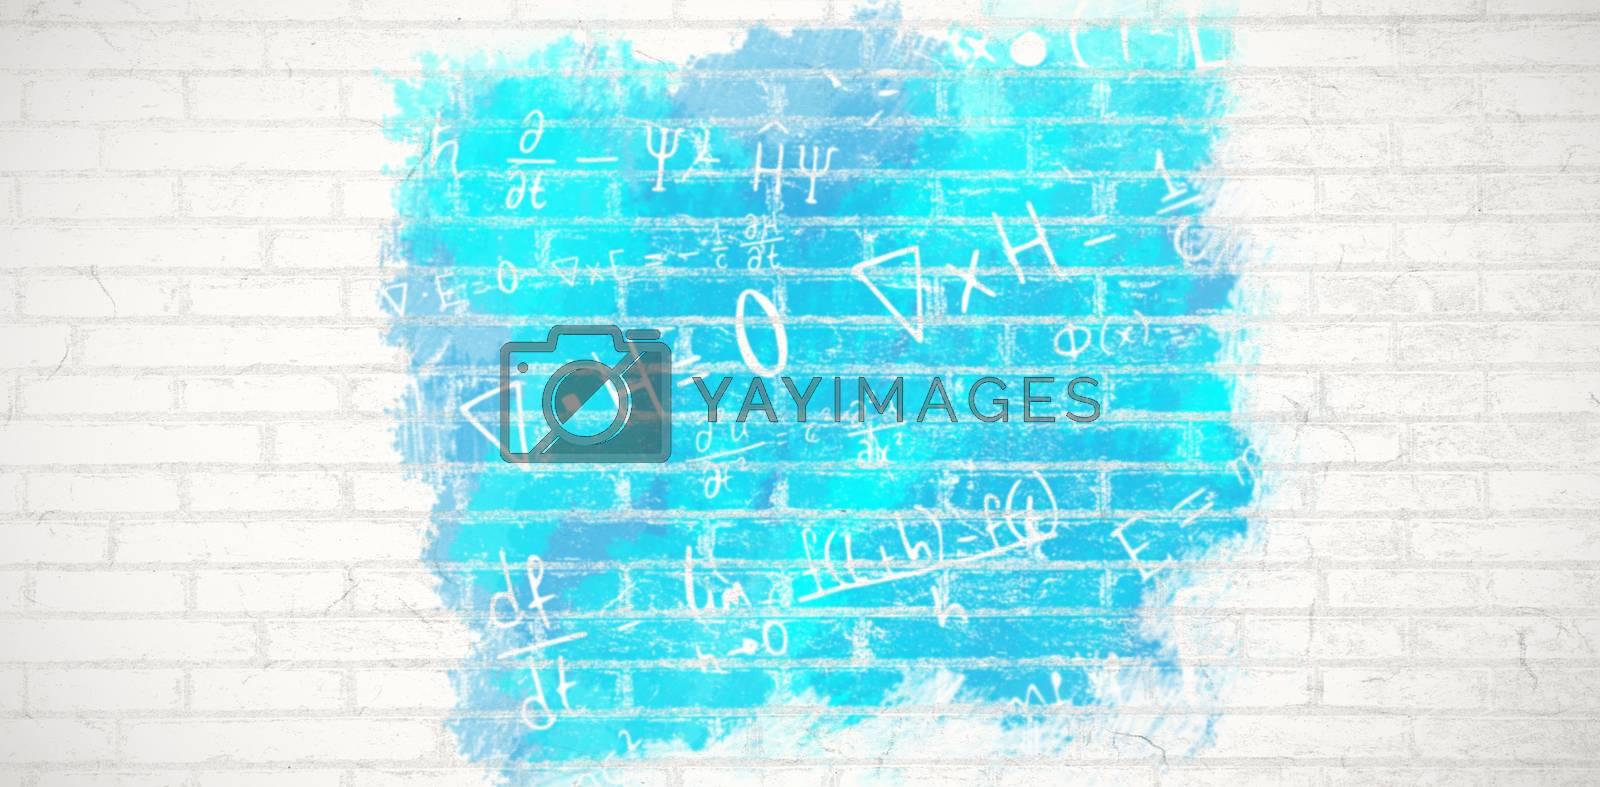 Composite image of digital composite image of algebraic formulas by Wavebreakmedia